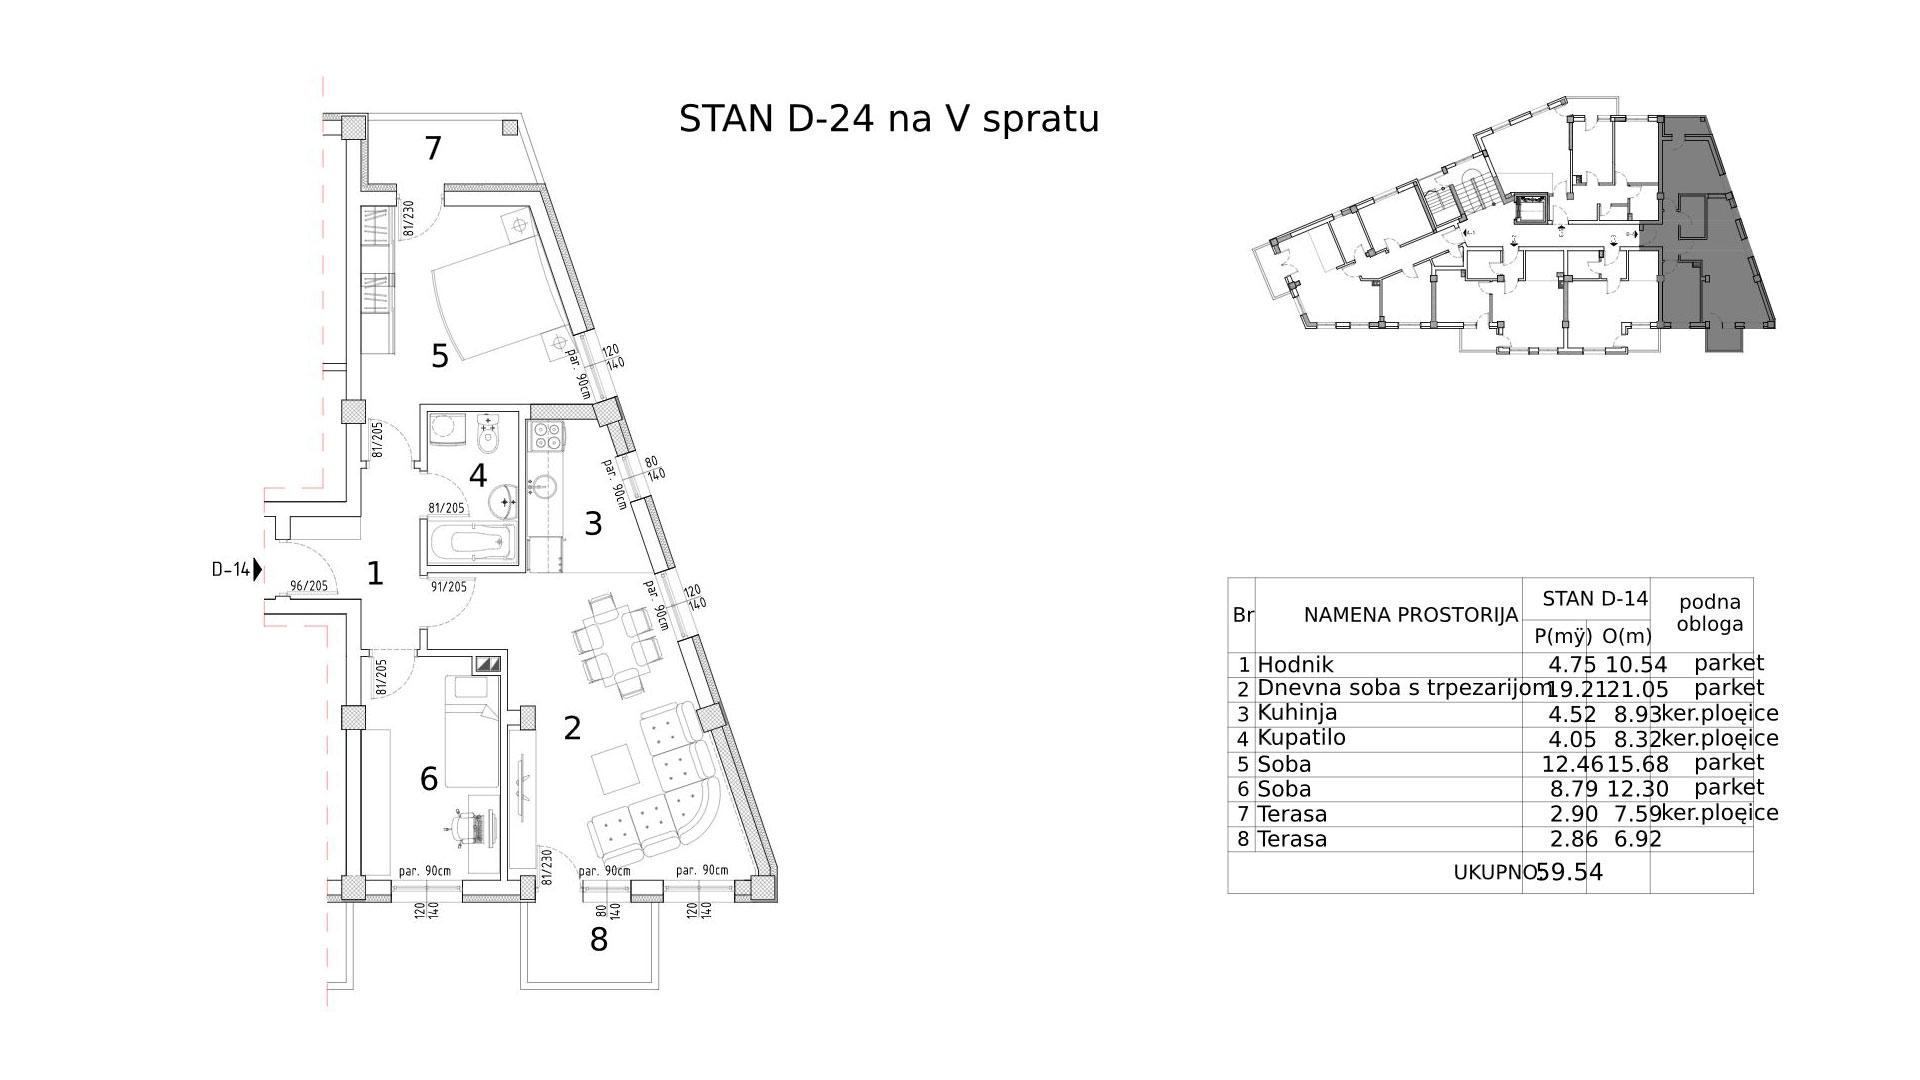 Objekat u Somborskoj 79 - stan D24